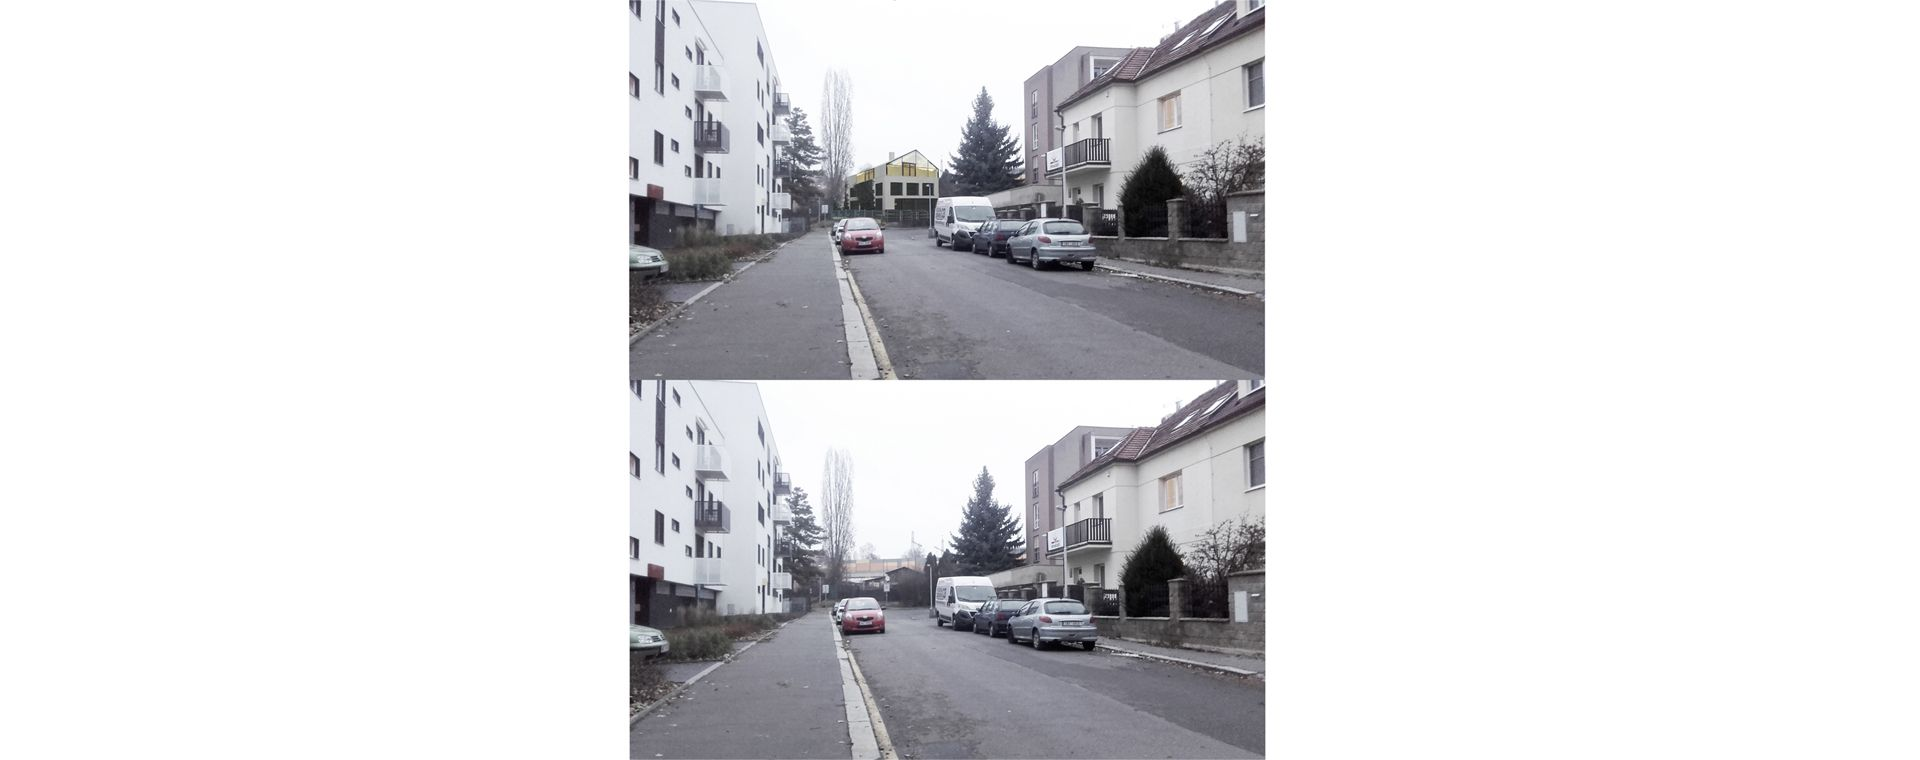 A new villa house, Prague Hostivar, an architectural design / concept, 2016-2018, CZ